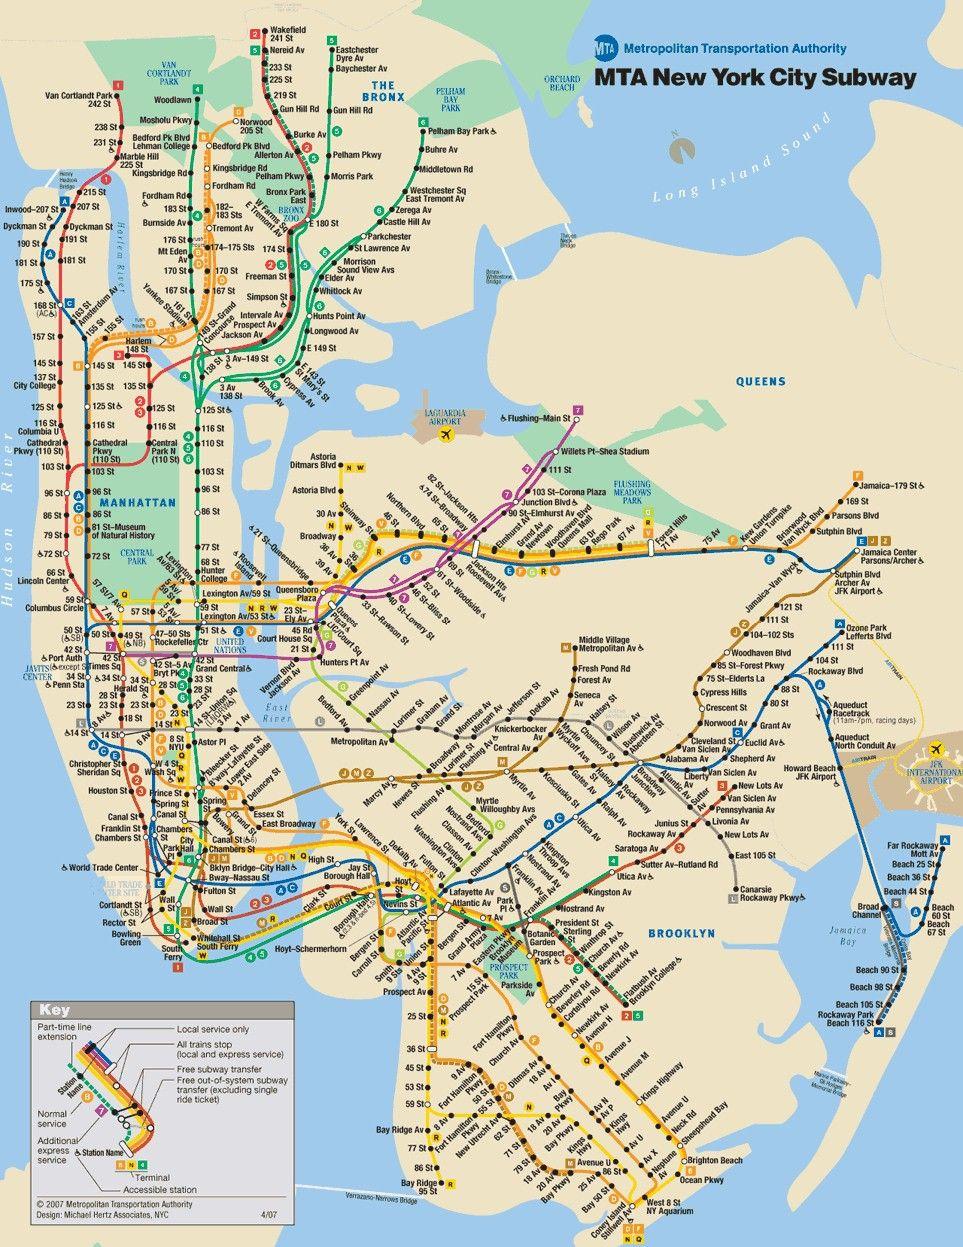 Vintage New York Subway Maps | New York City Subway Map Printable - Free Printable Map Of New York City